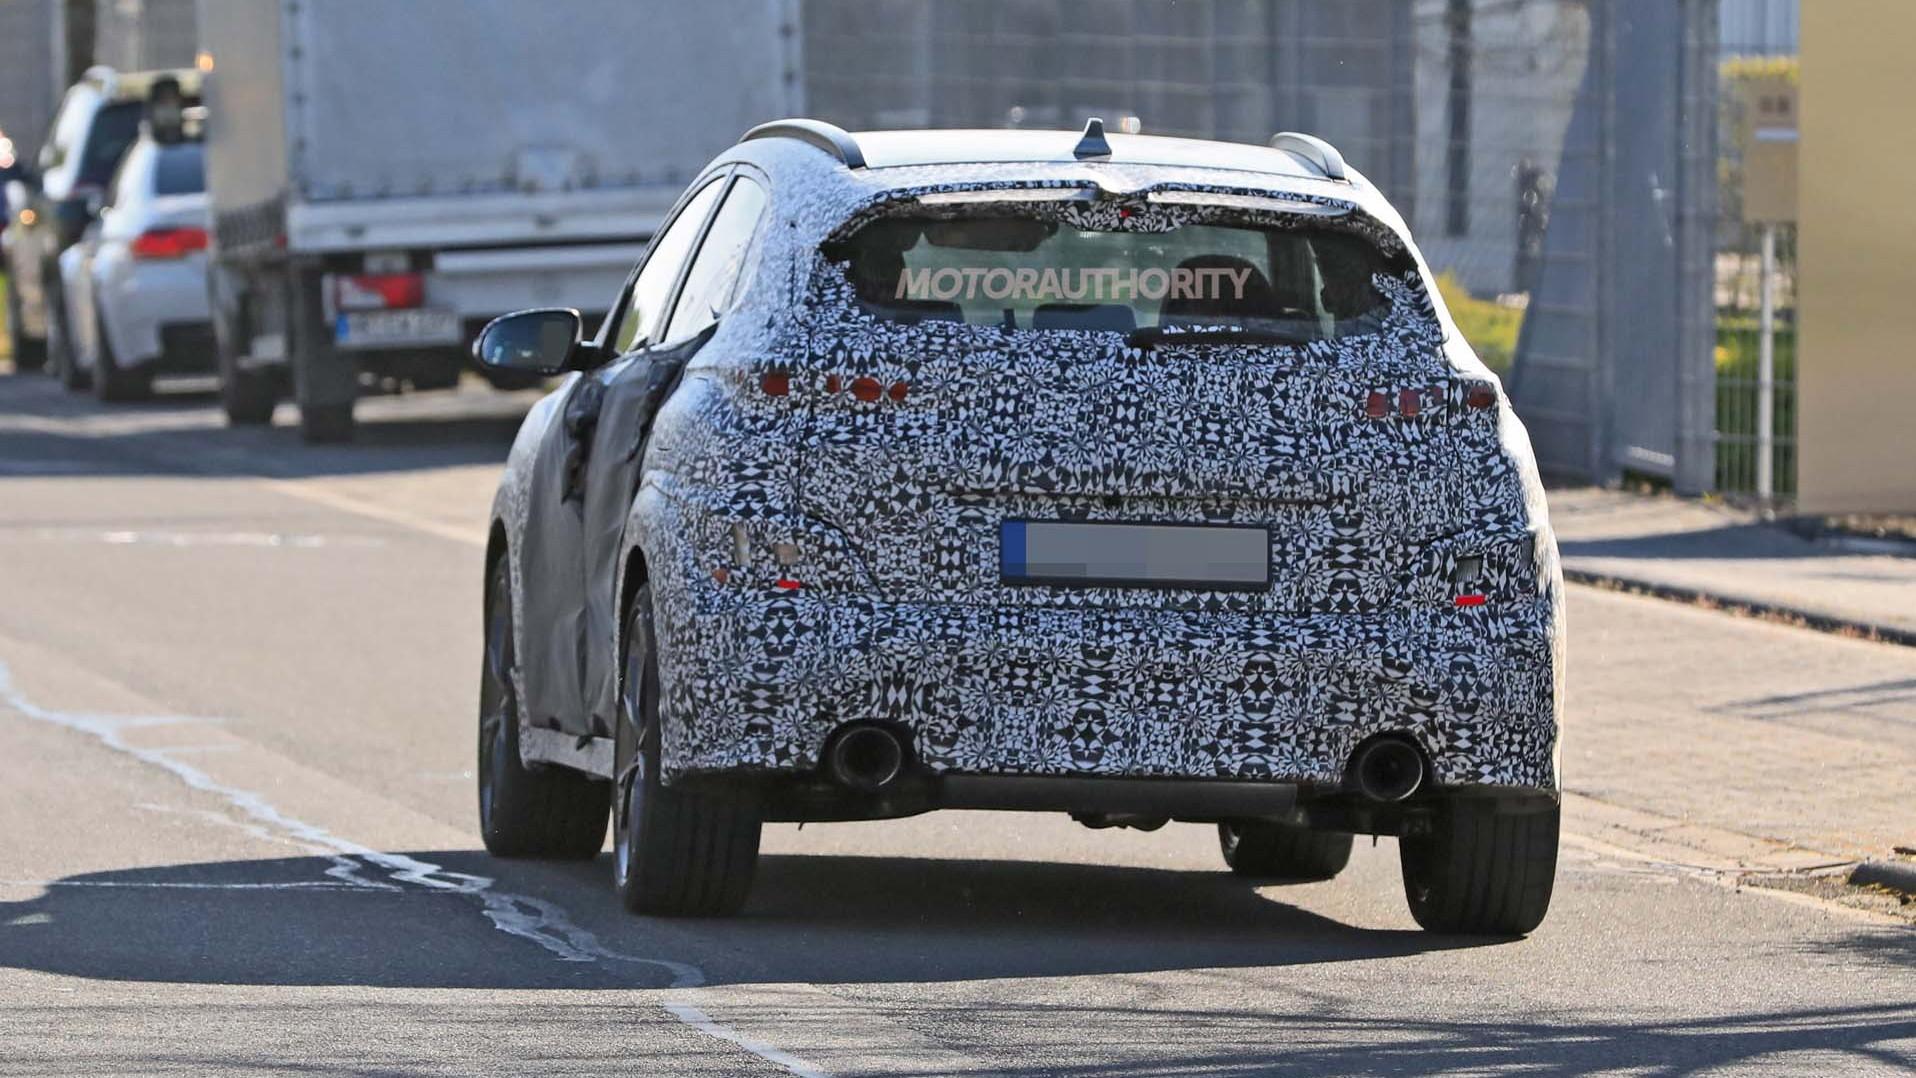 2022 Hyundai Kona N spy shots - Photo credit: S. Baldauf/SB-Medien